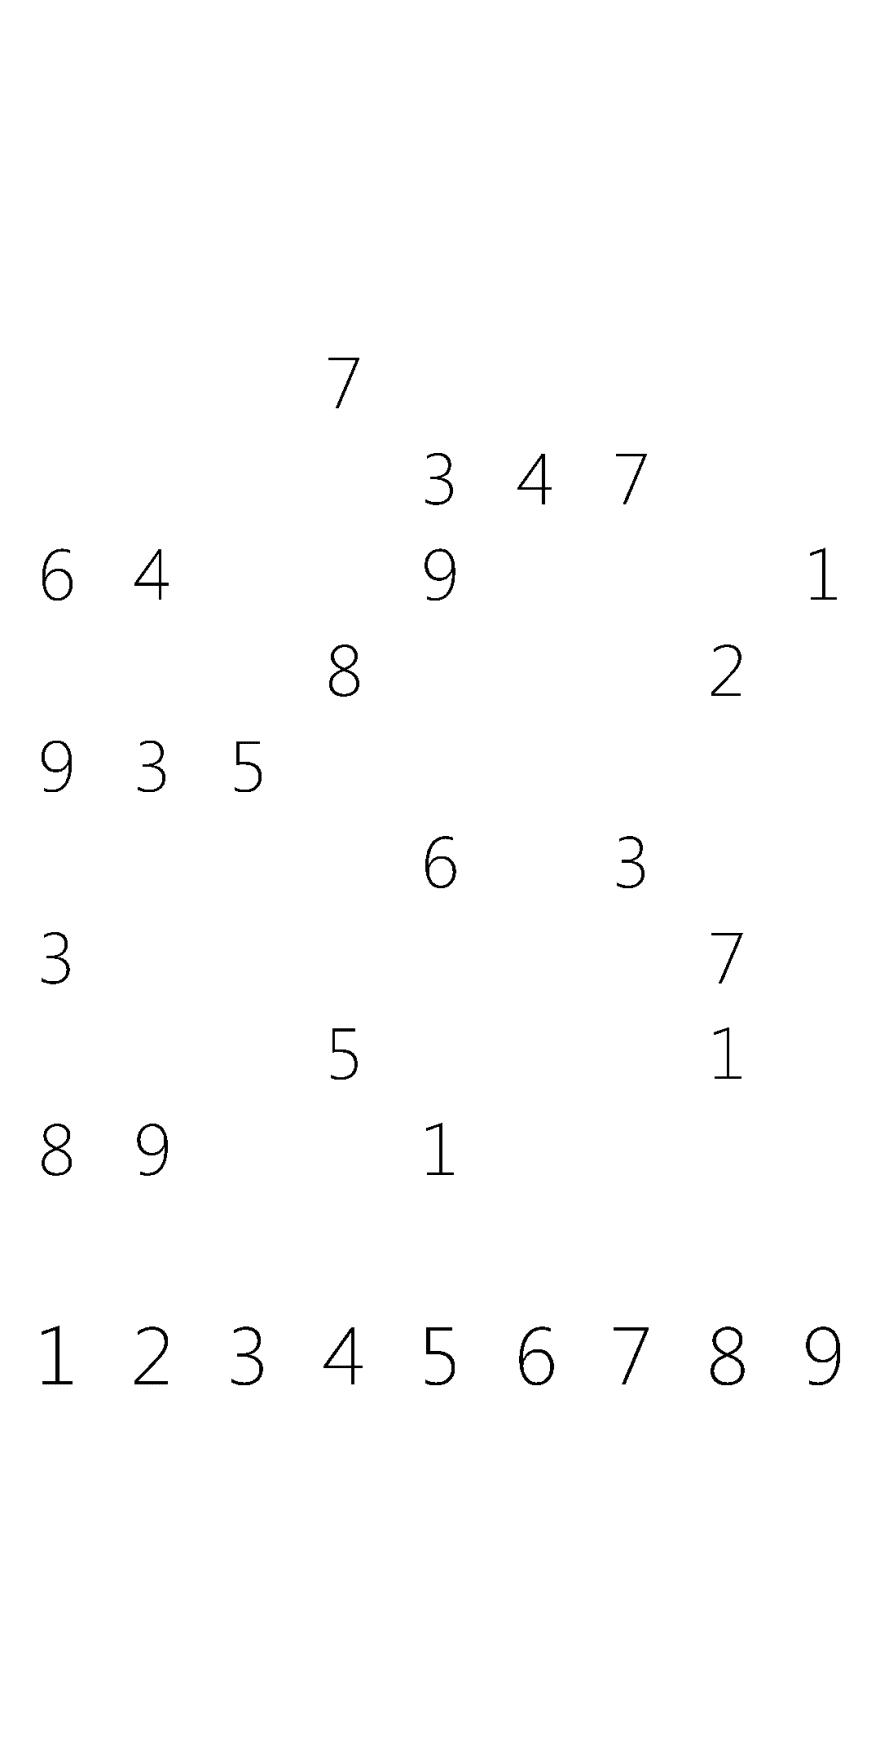 Processed Screenshot of Sudoku